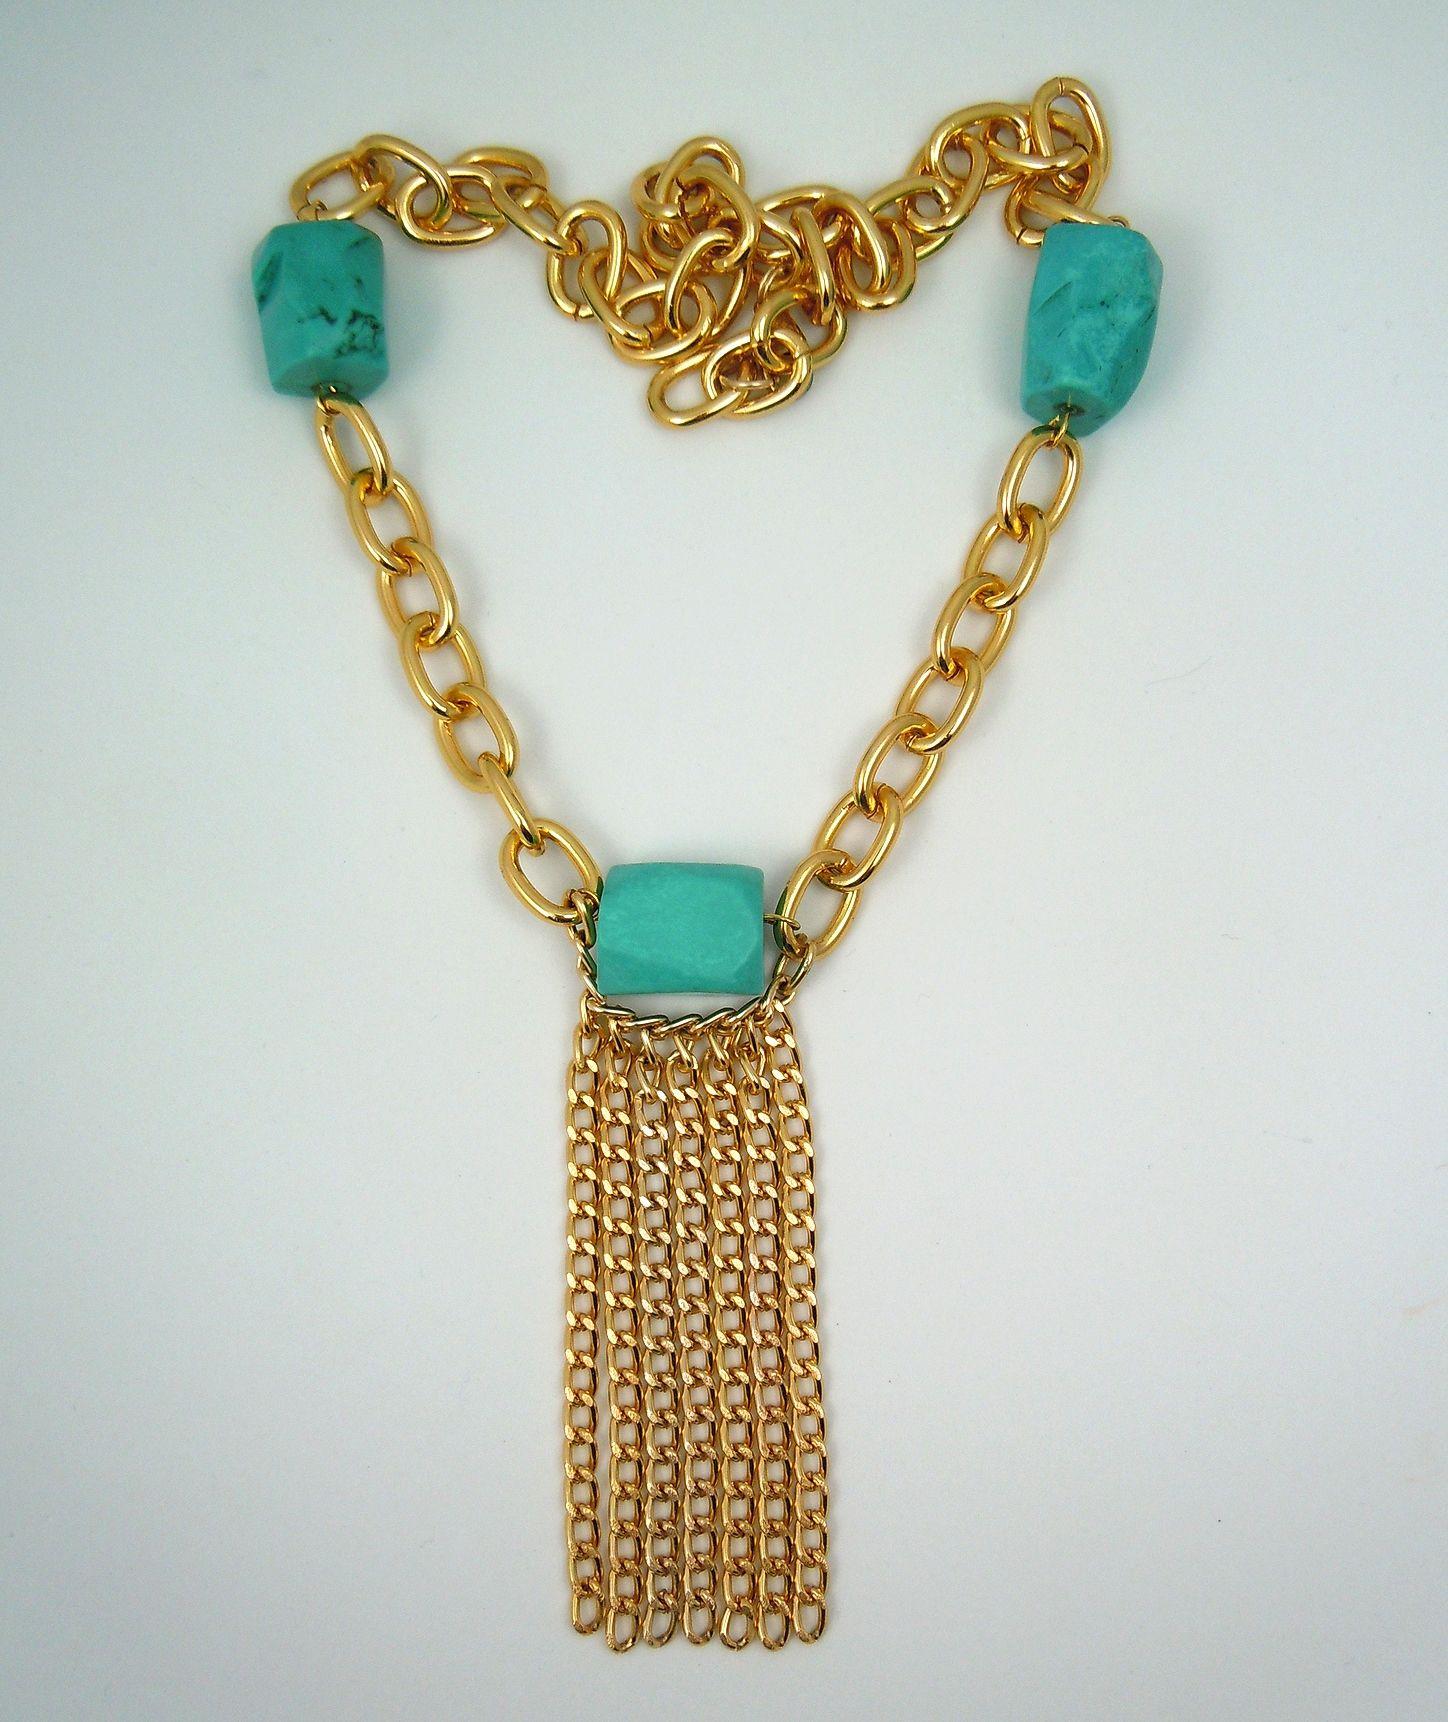 791c738287830 House of Zada Teal Green Magnesite Gemstone Statement Gold Dangle ...